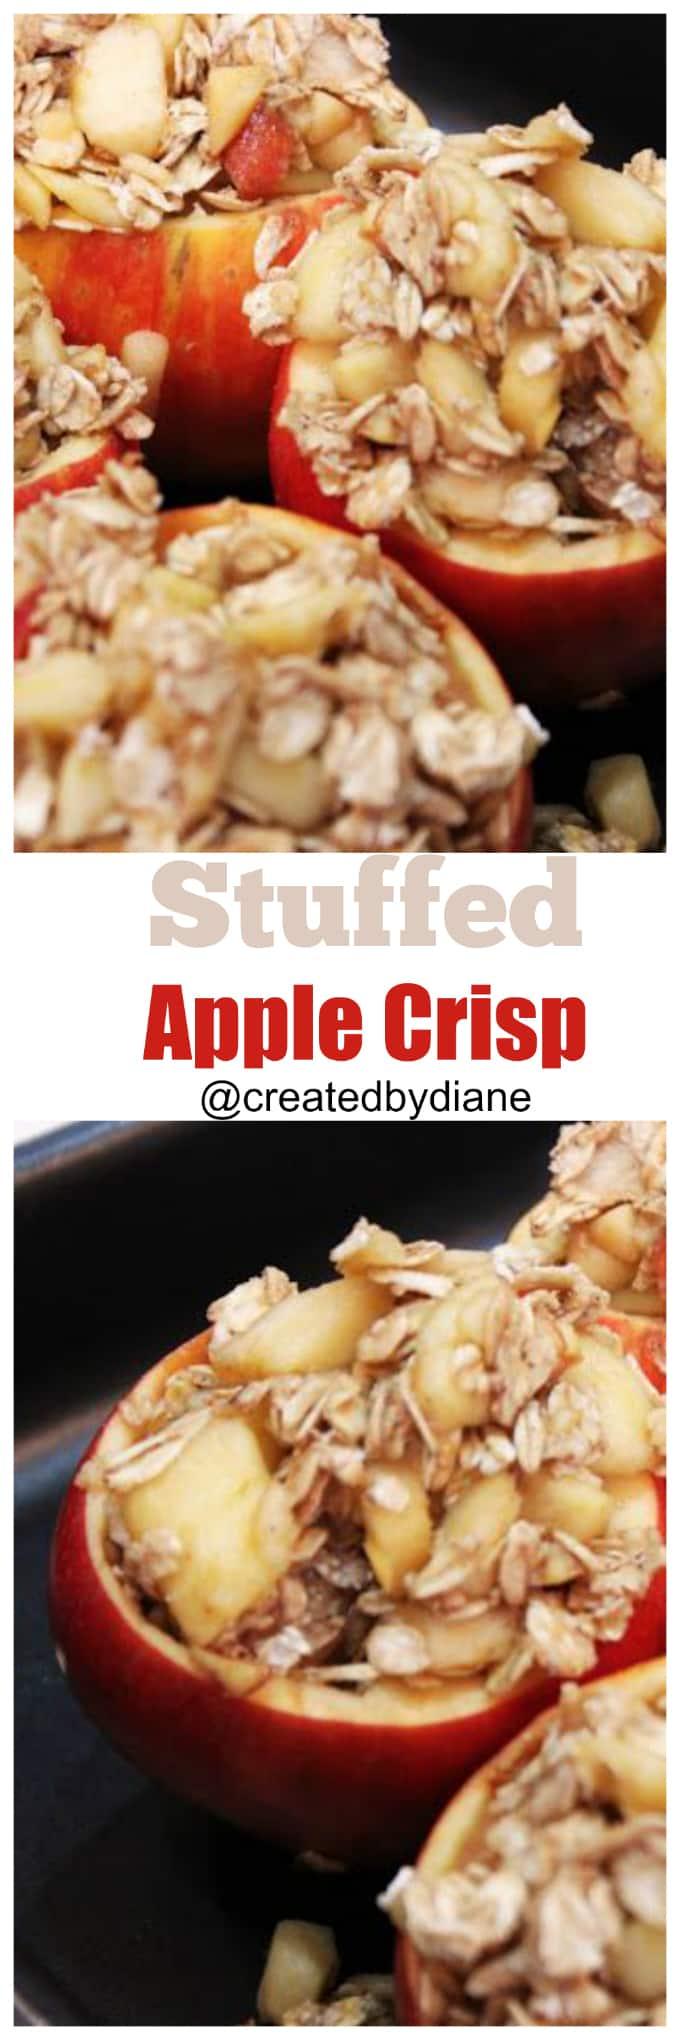 stuffed-apple-crisp-createdbydiane